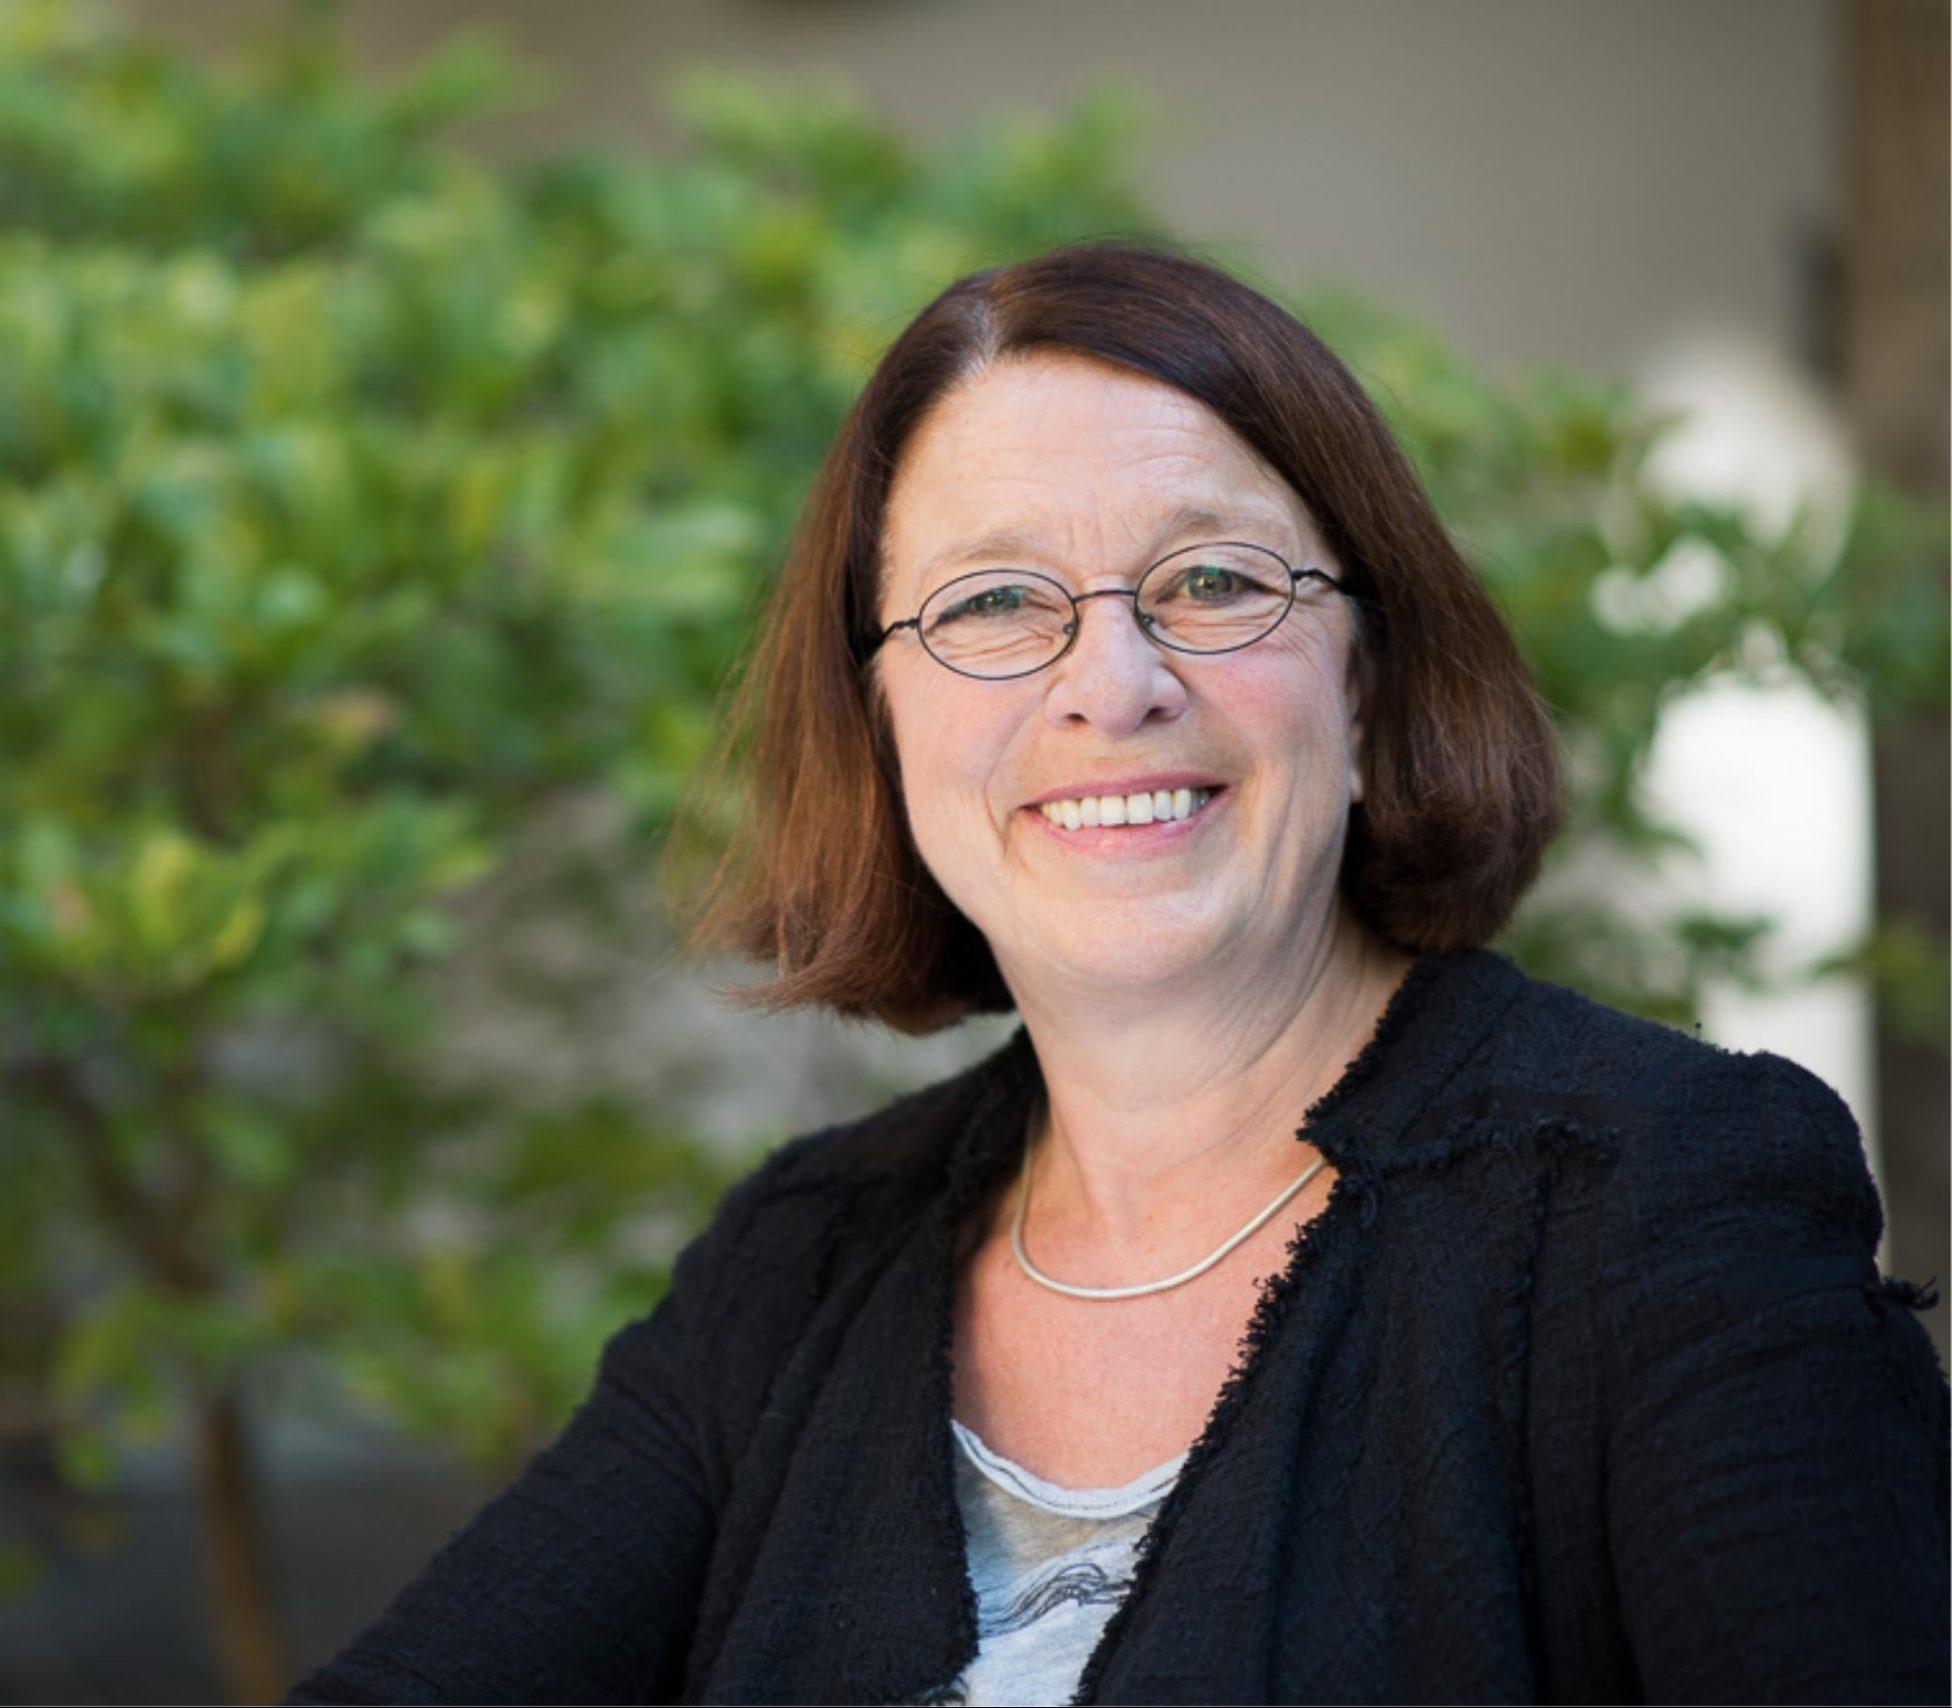 Christiane Ohngemach